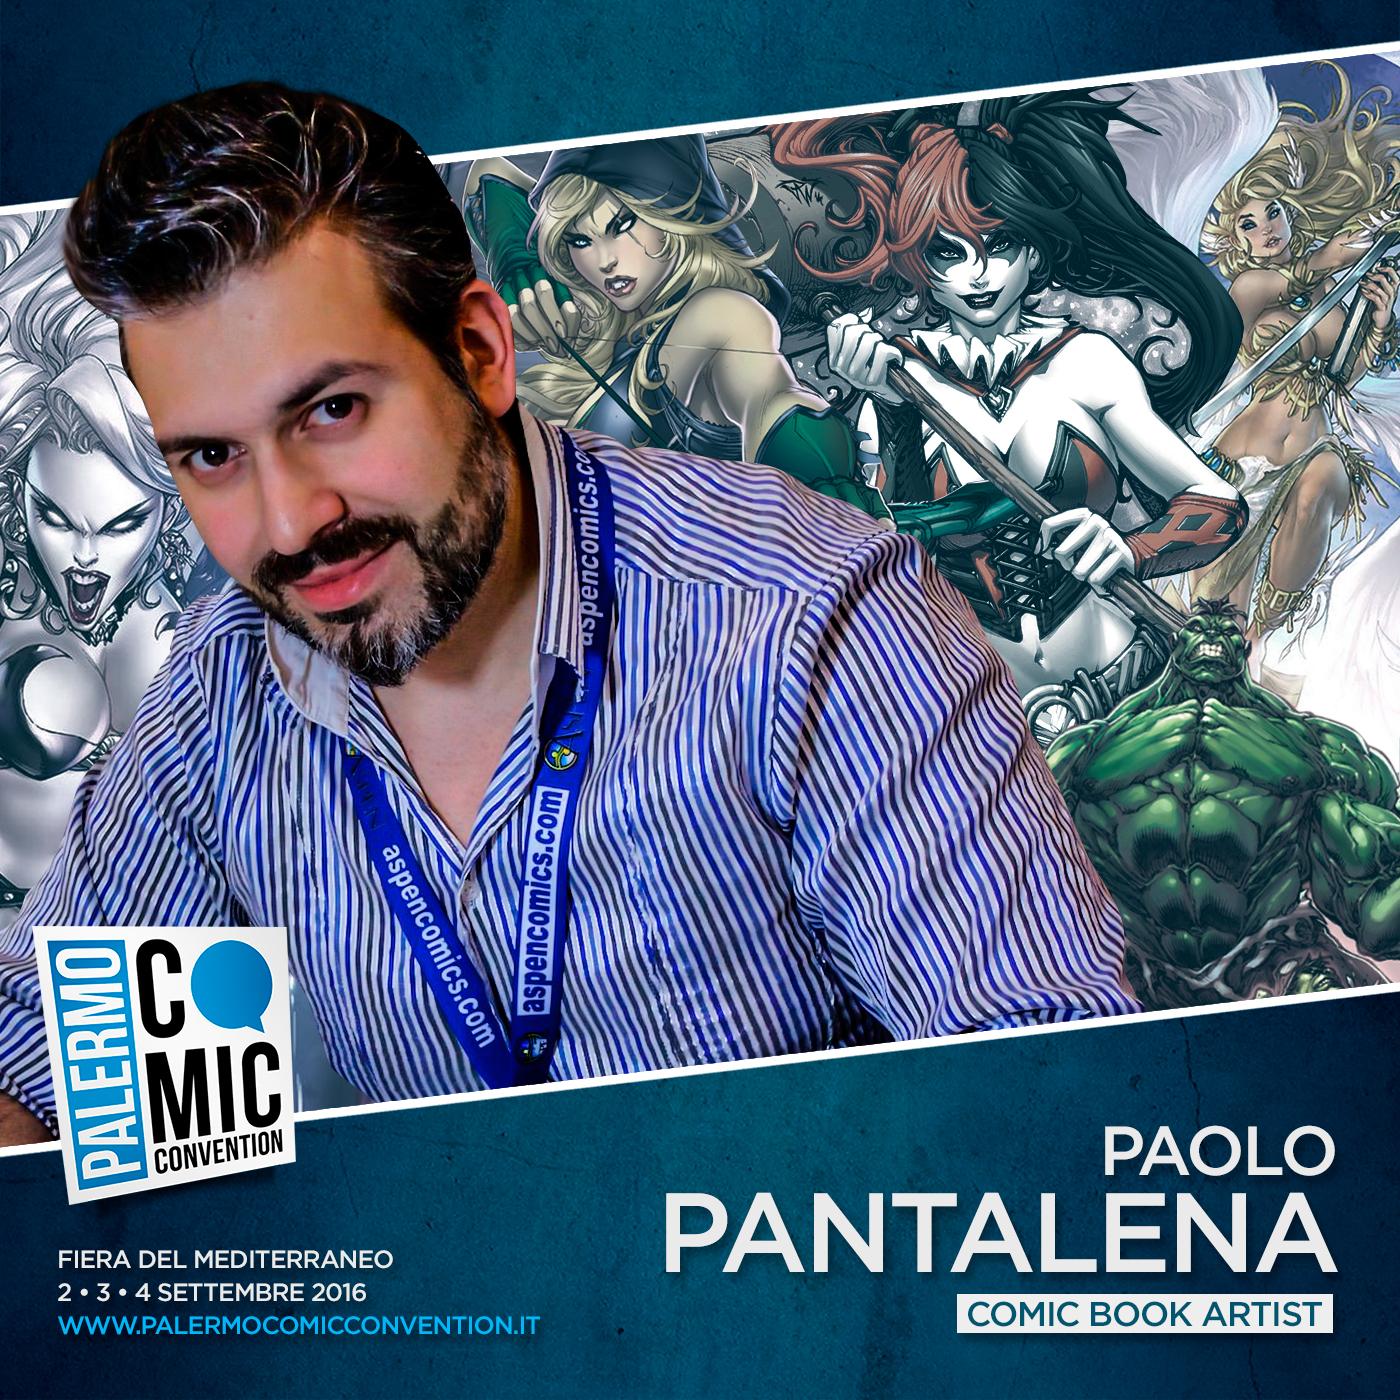 Paolo Pantalena